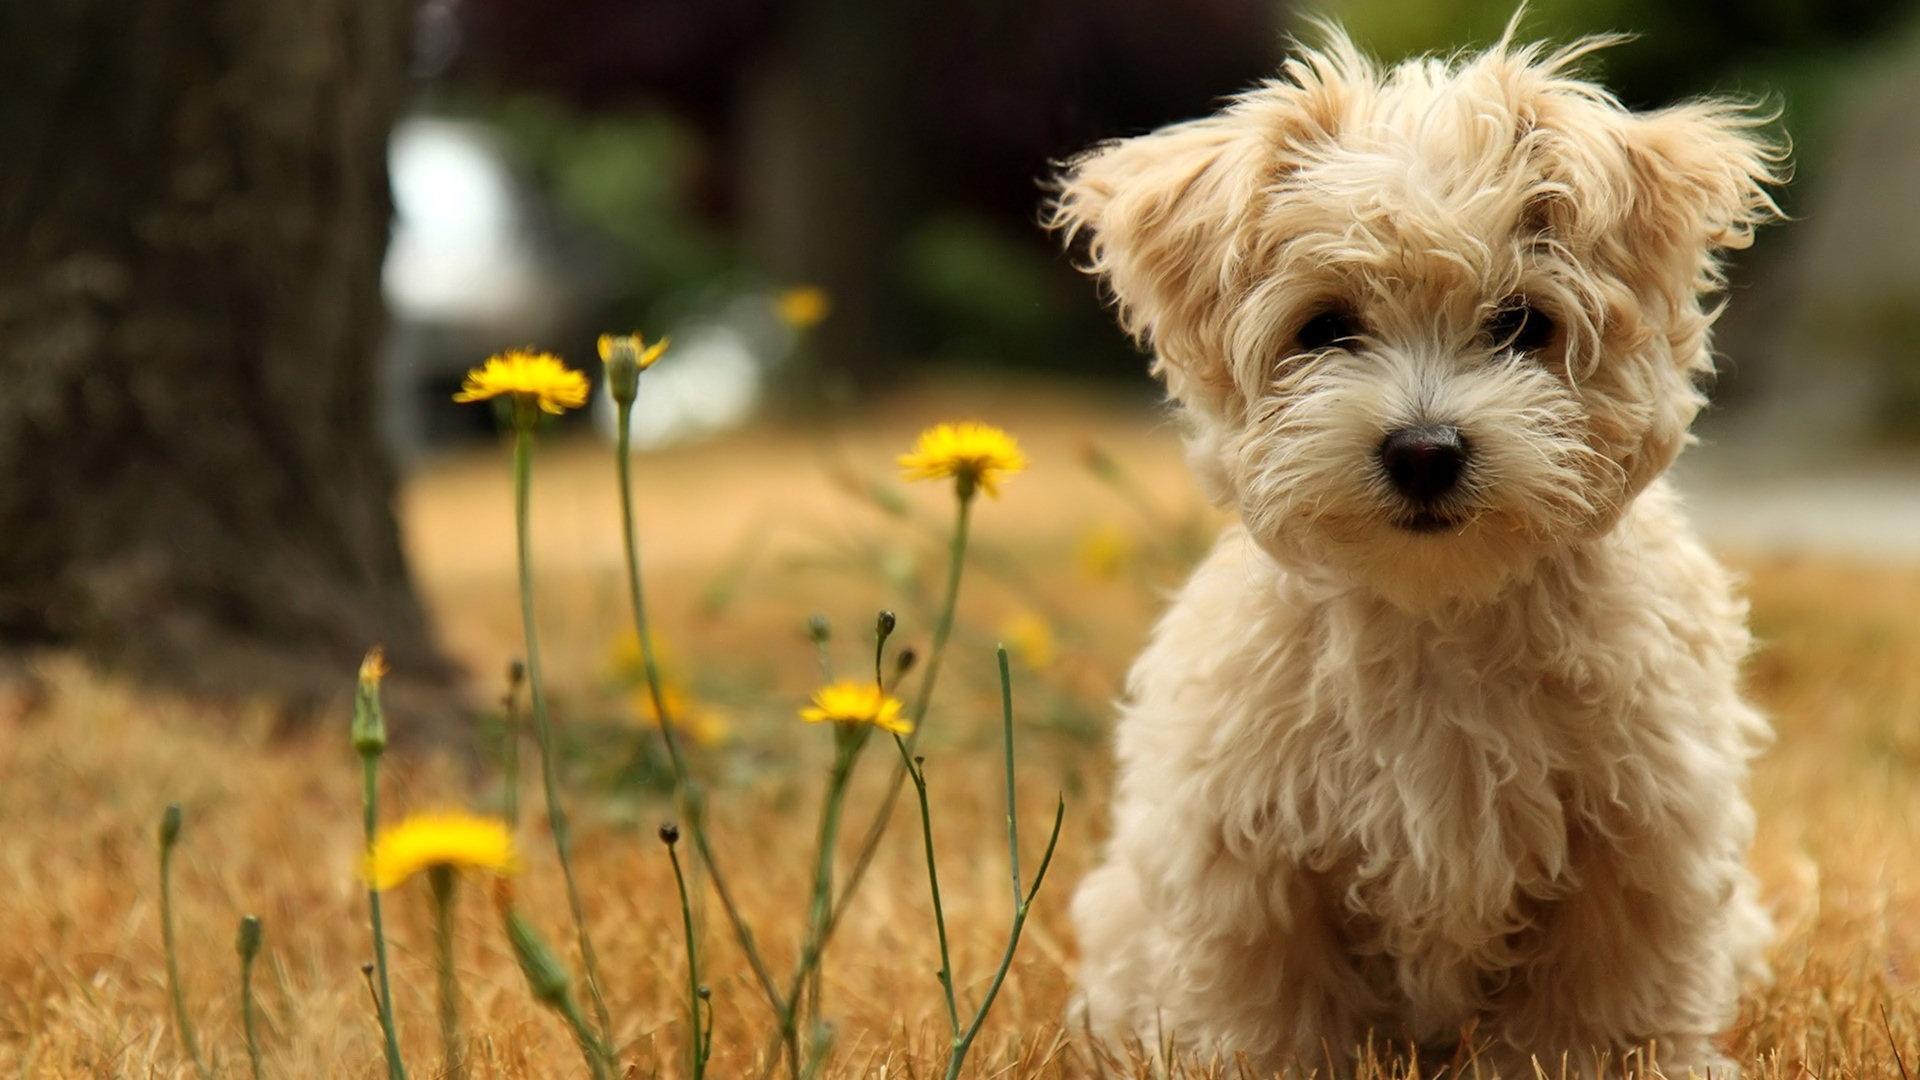 Cute Dog Wallpaper 1920x1080